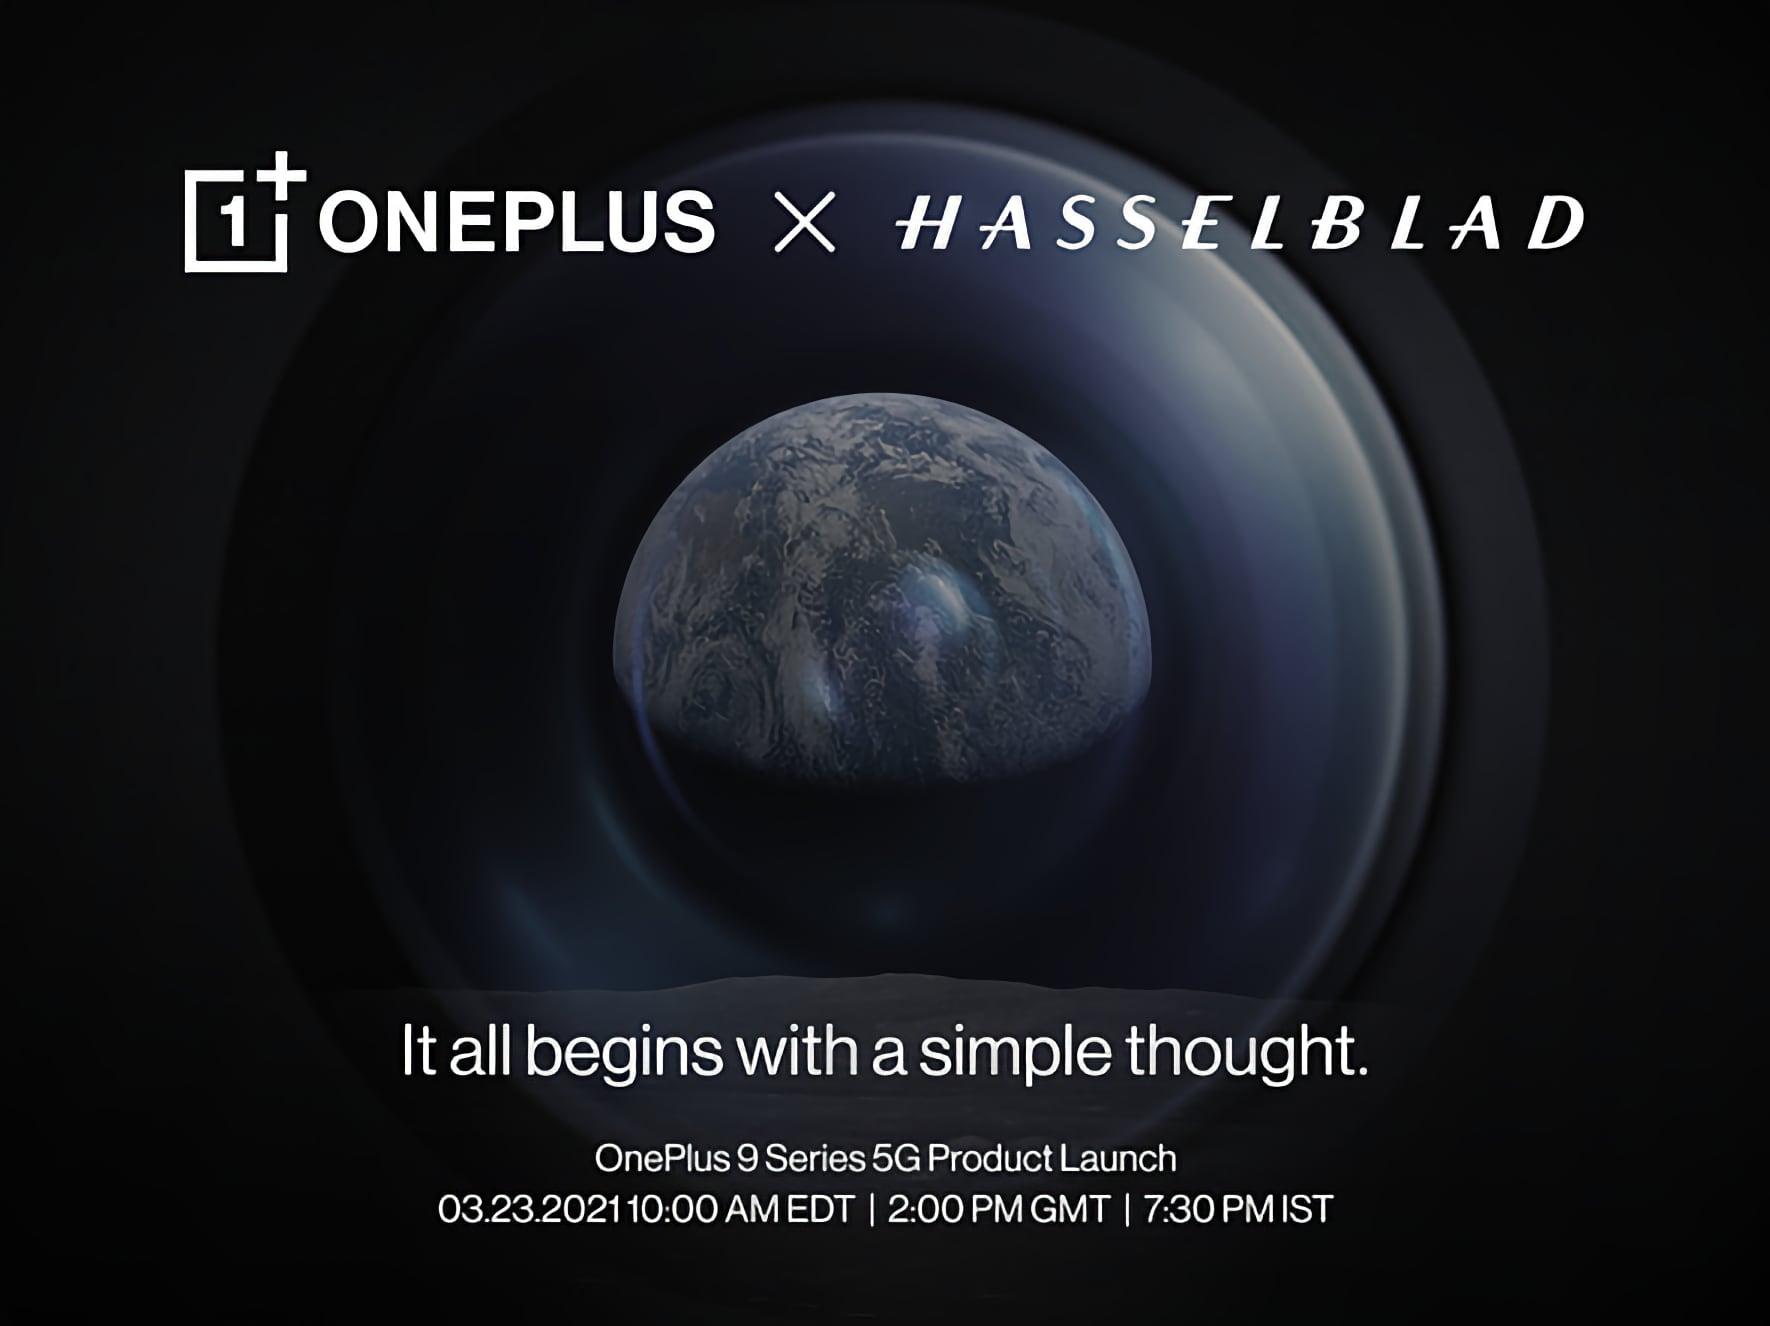 Hasselblad x OnePlue